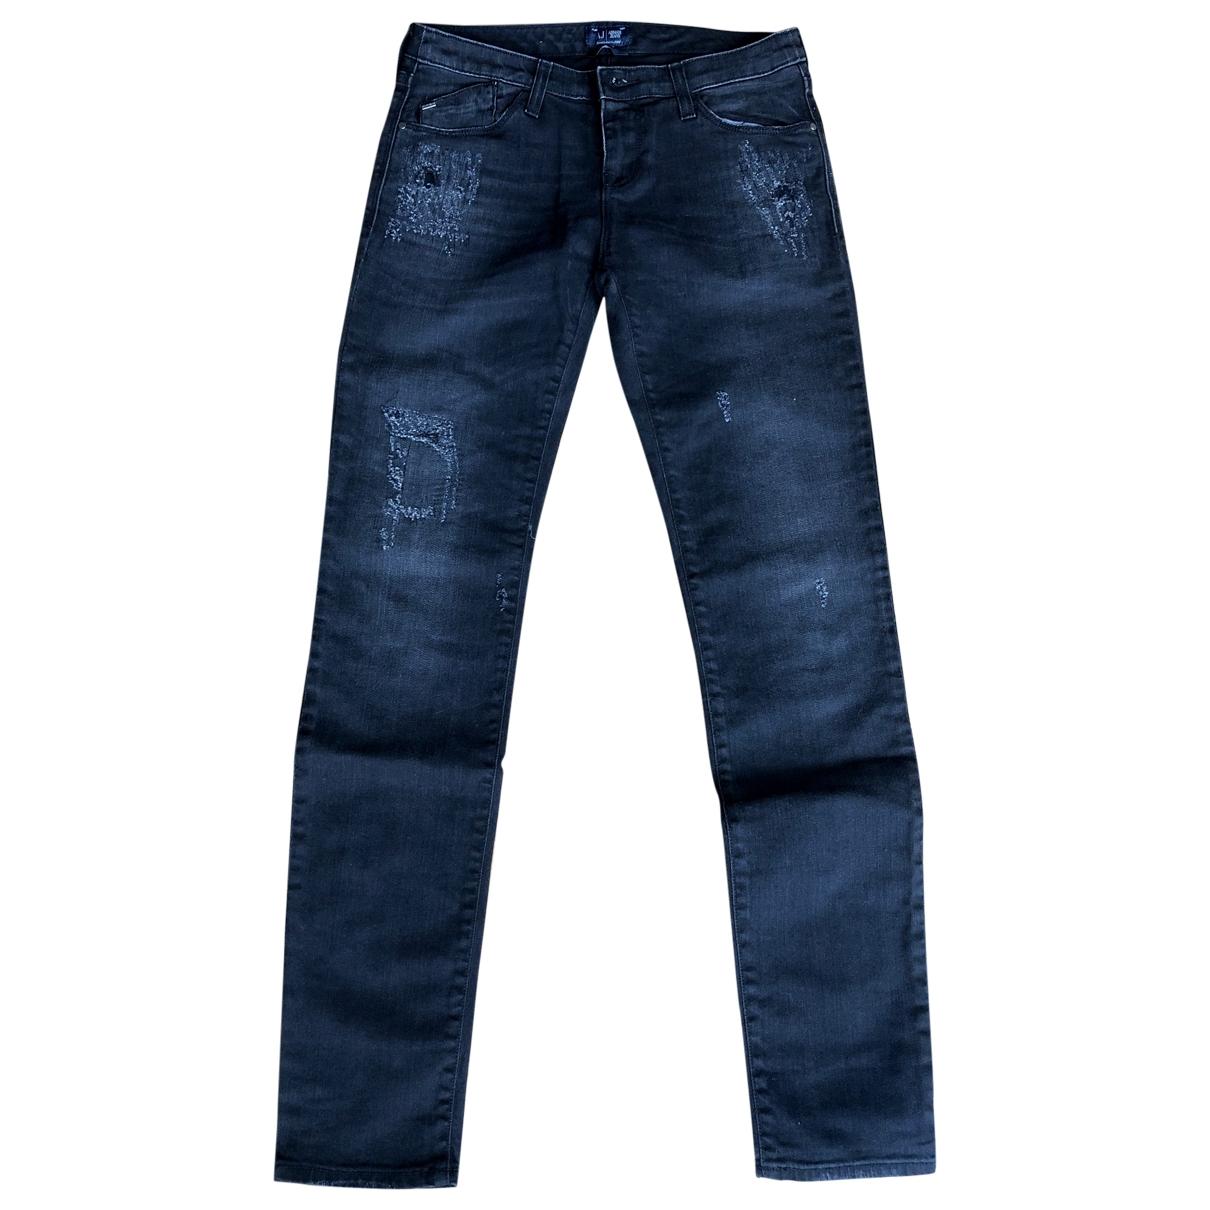 Armani Jeans \N Black Cotton Jeans for Women 26 US